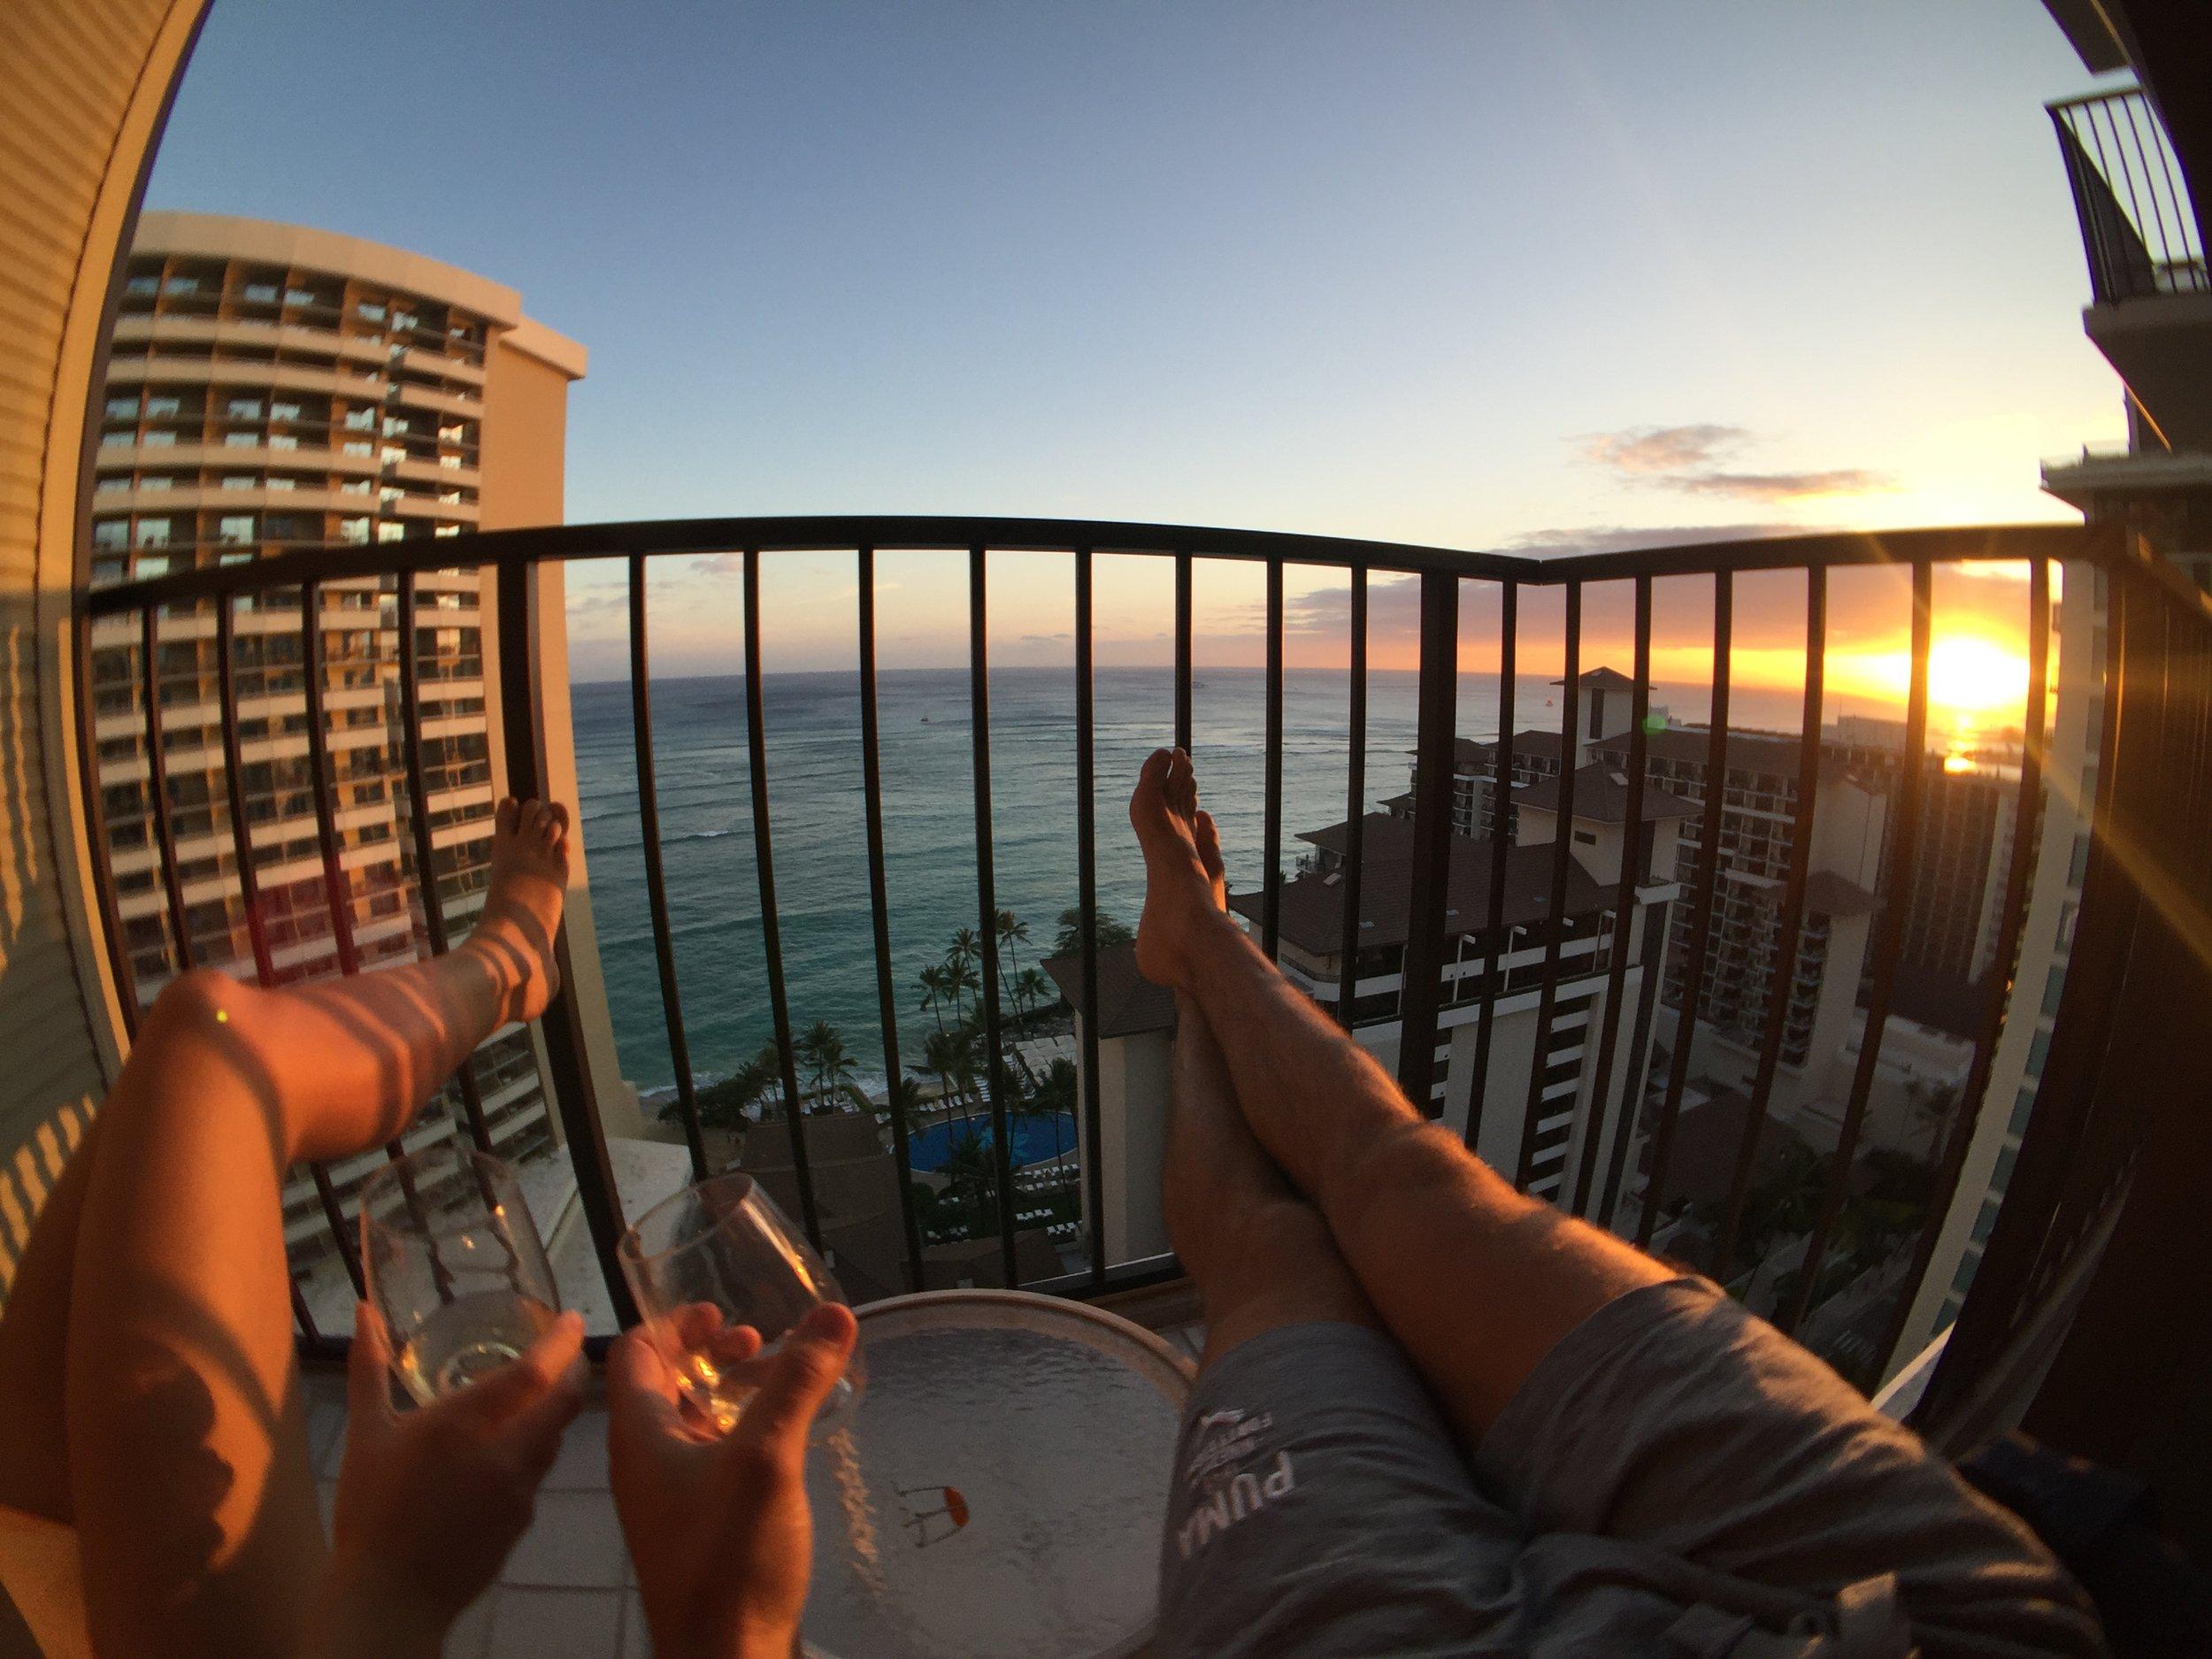 Those Hawaiian sunsets though...